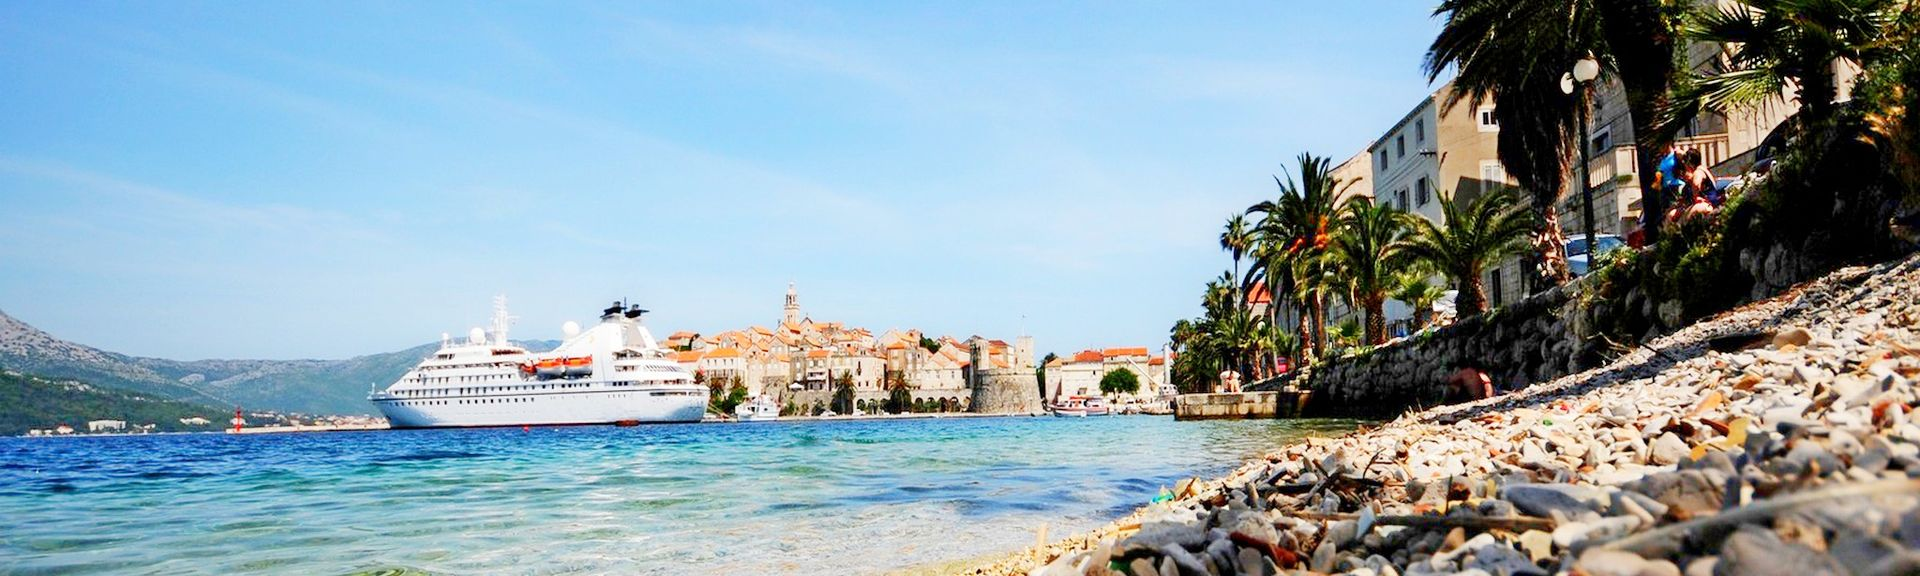 Korcula Old Town, Korcula, Dubrovnik-Neretva, Croatia